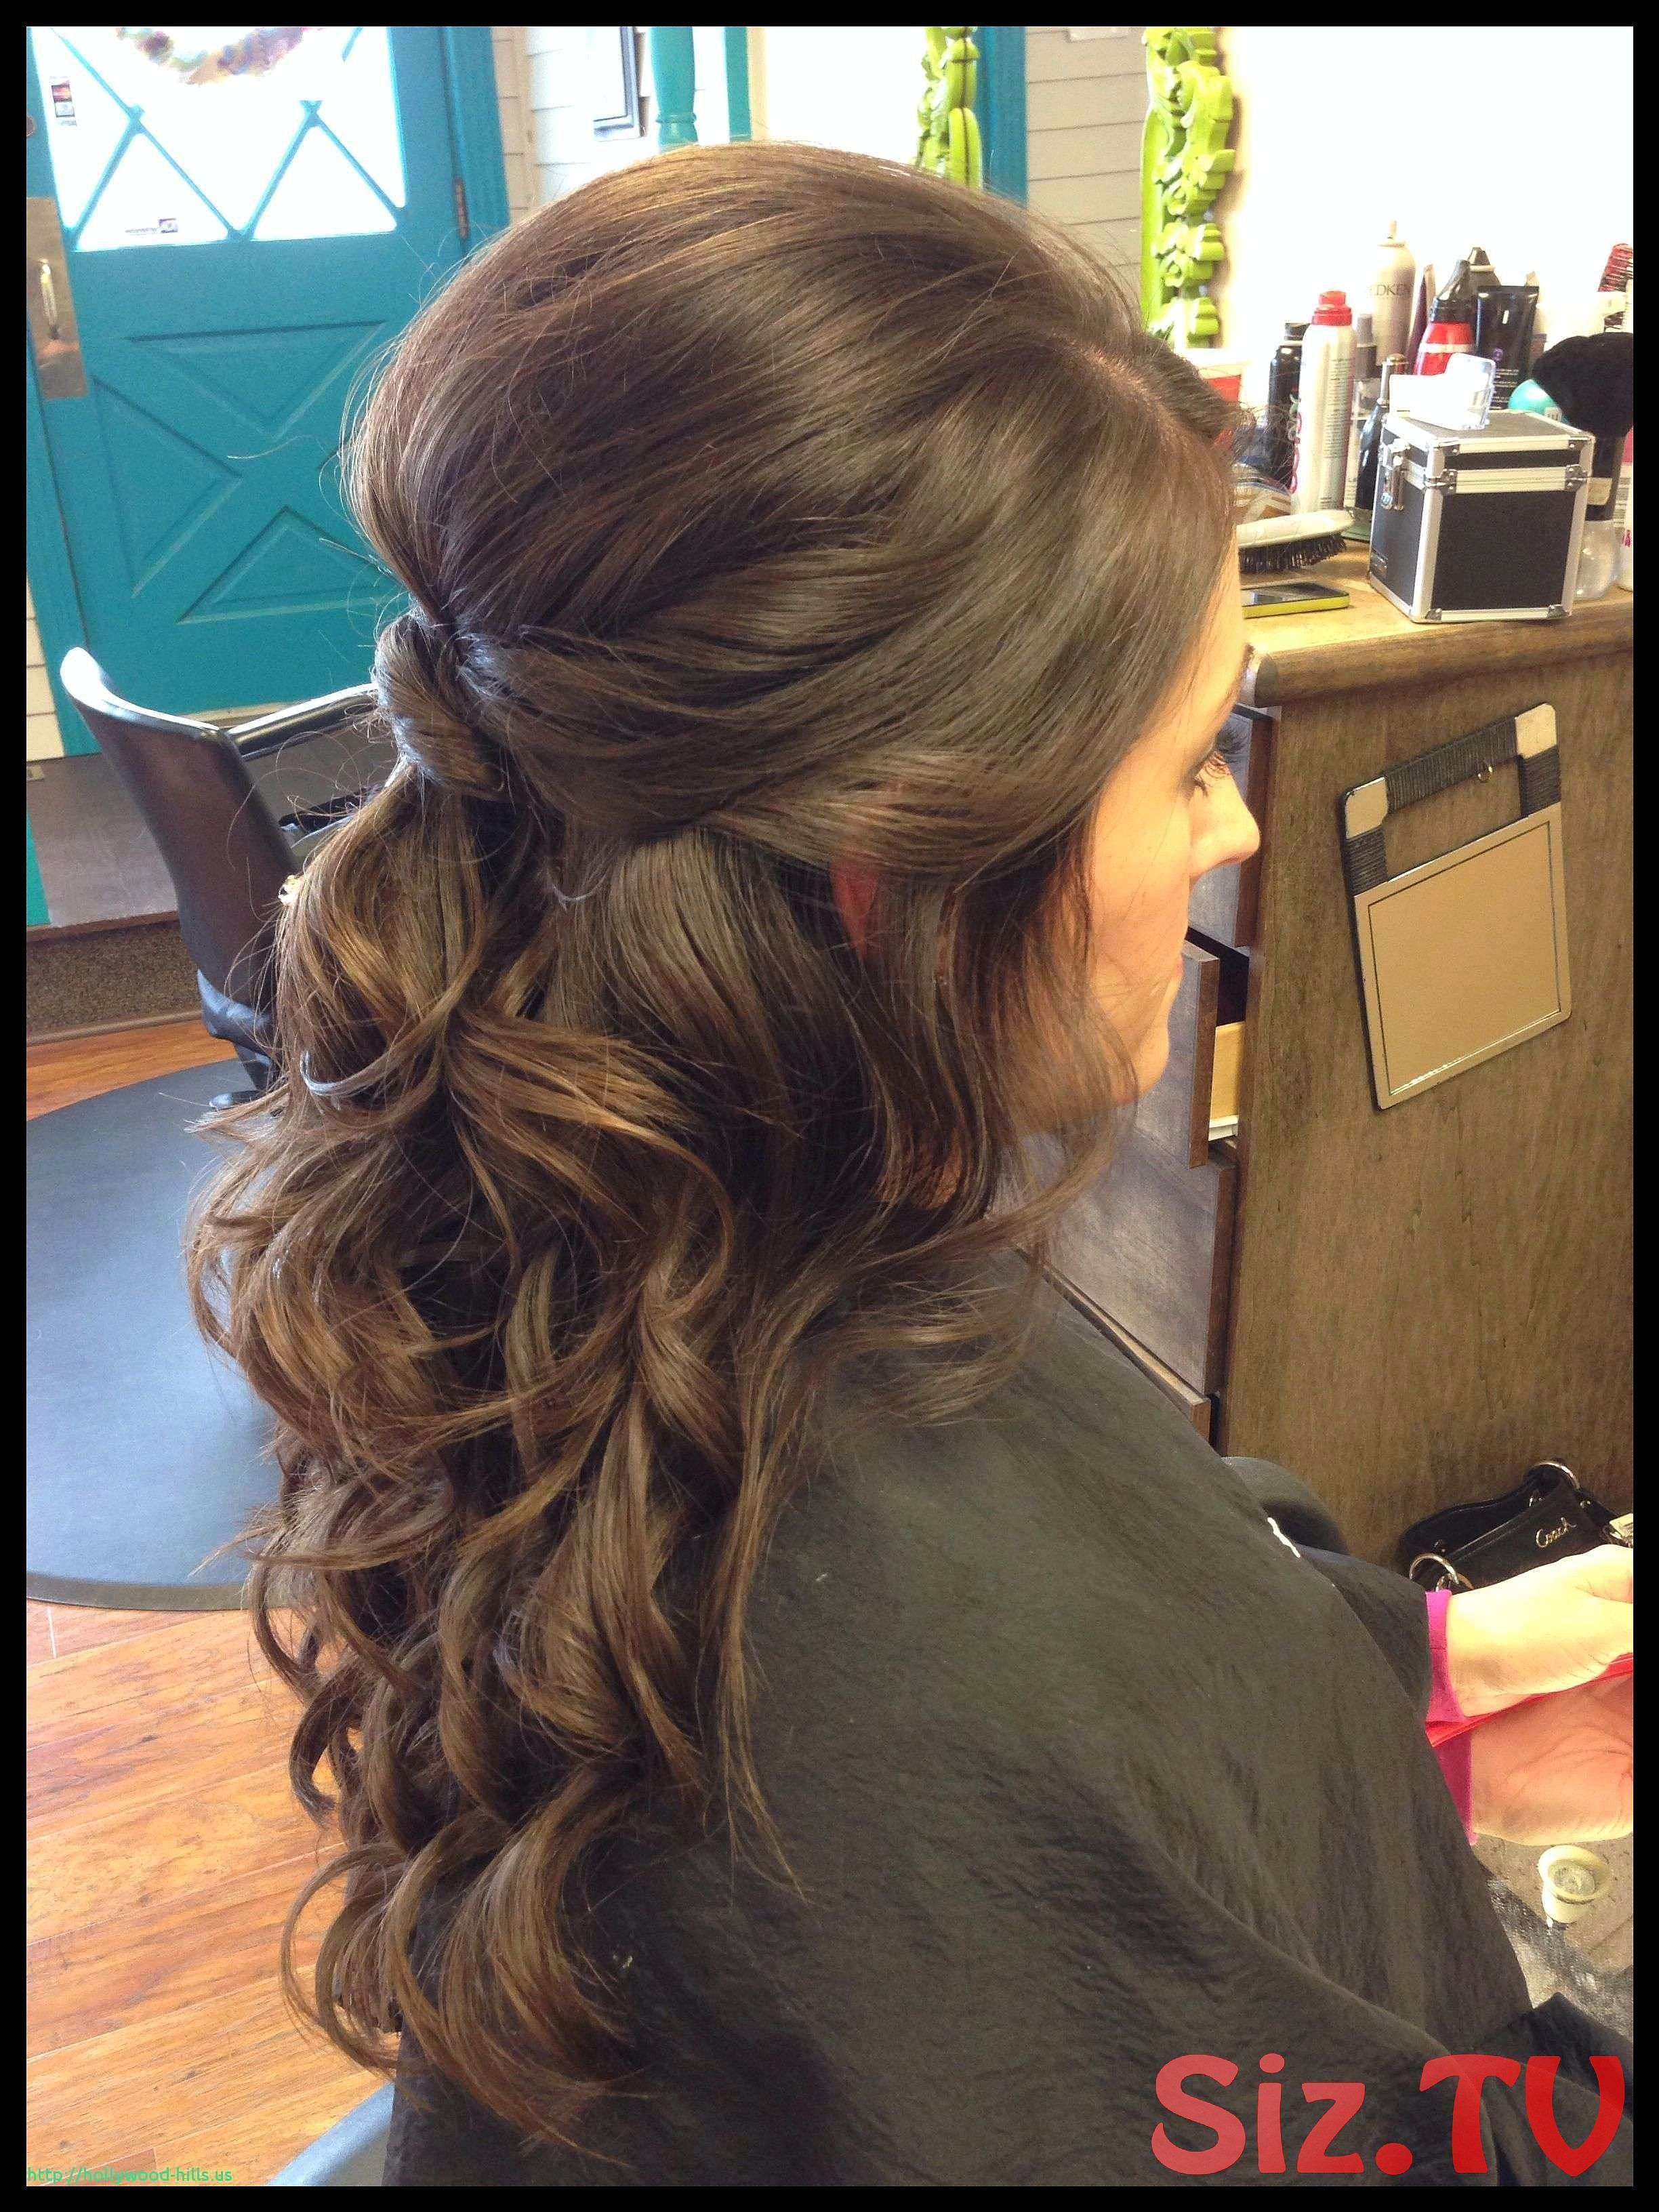 Half Updos For Long Hair New Half Updo Hairstyles Pinterest Gallery Half Updos For Long Hair New Half Up Hair Styles Straight Wedding Hair Elegant Wedding Hair